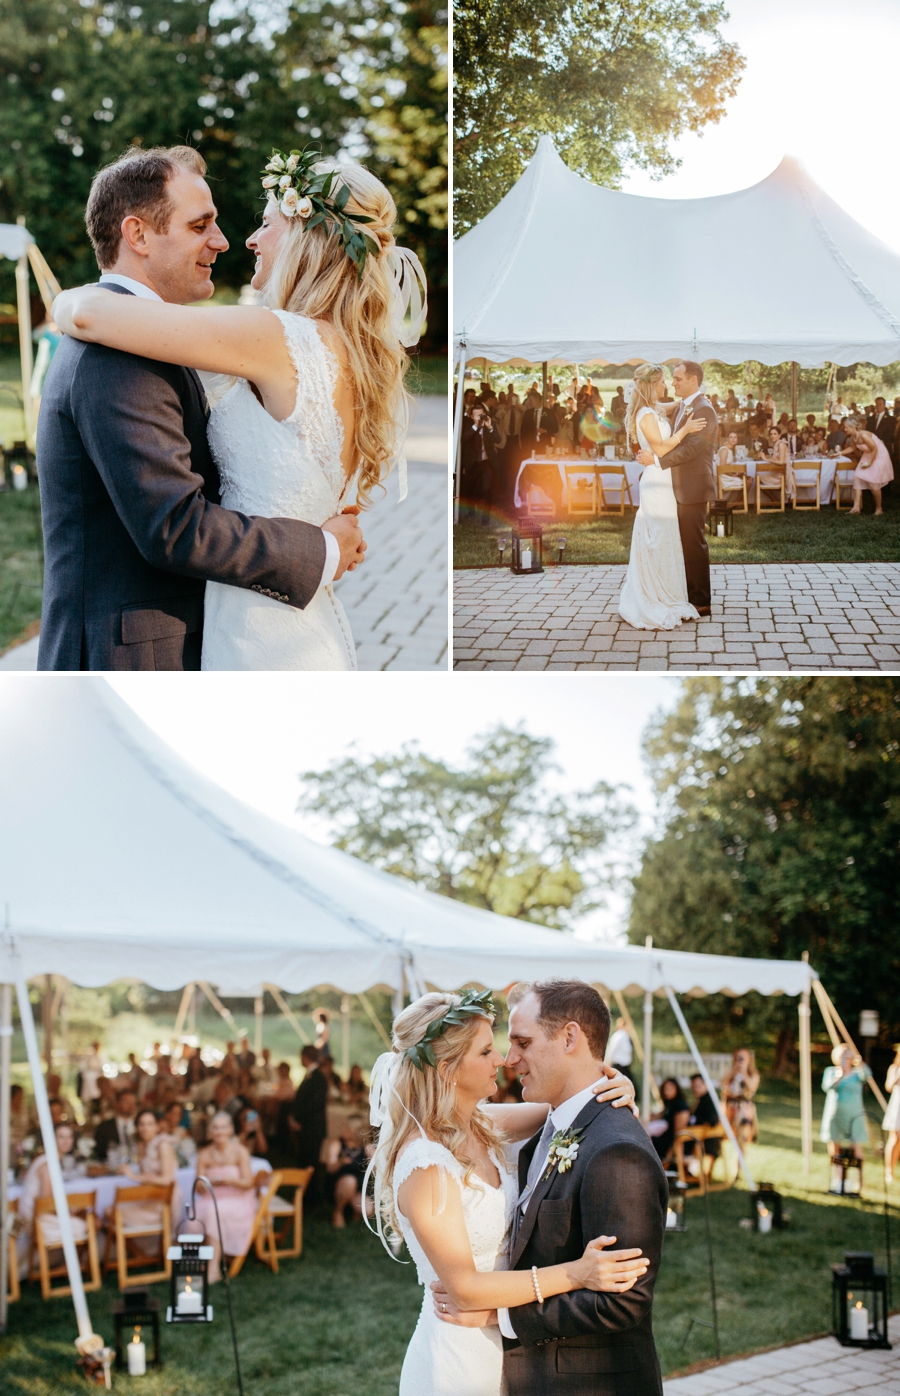 WillowWood-Arboretum-Wedding_0133